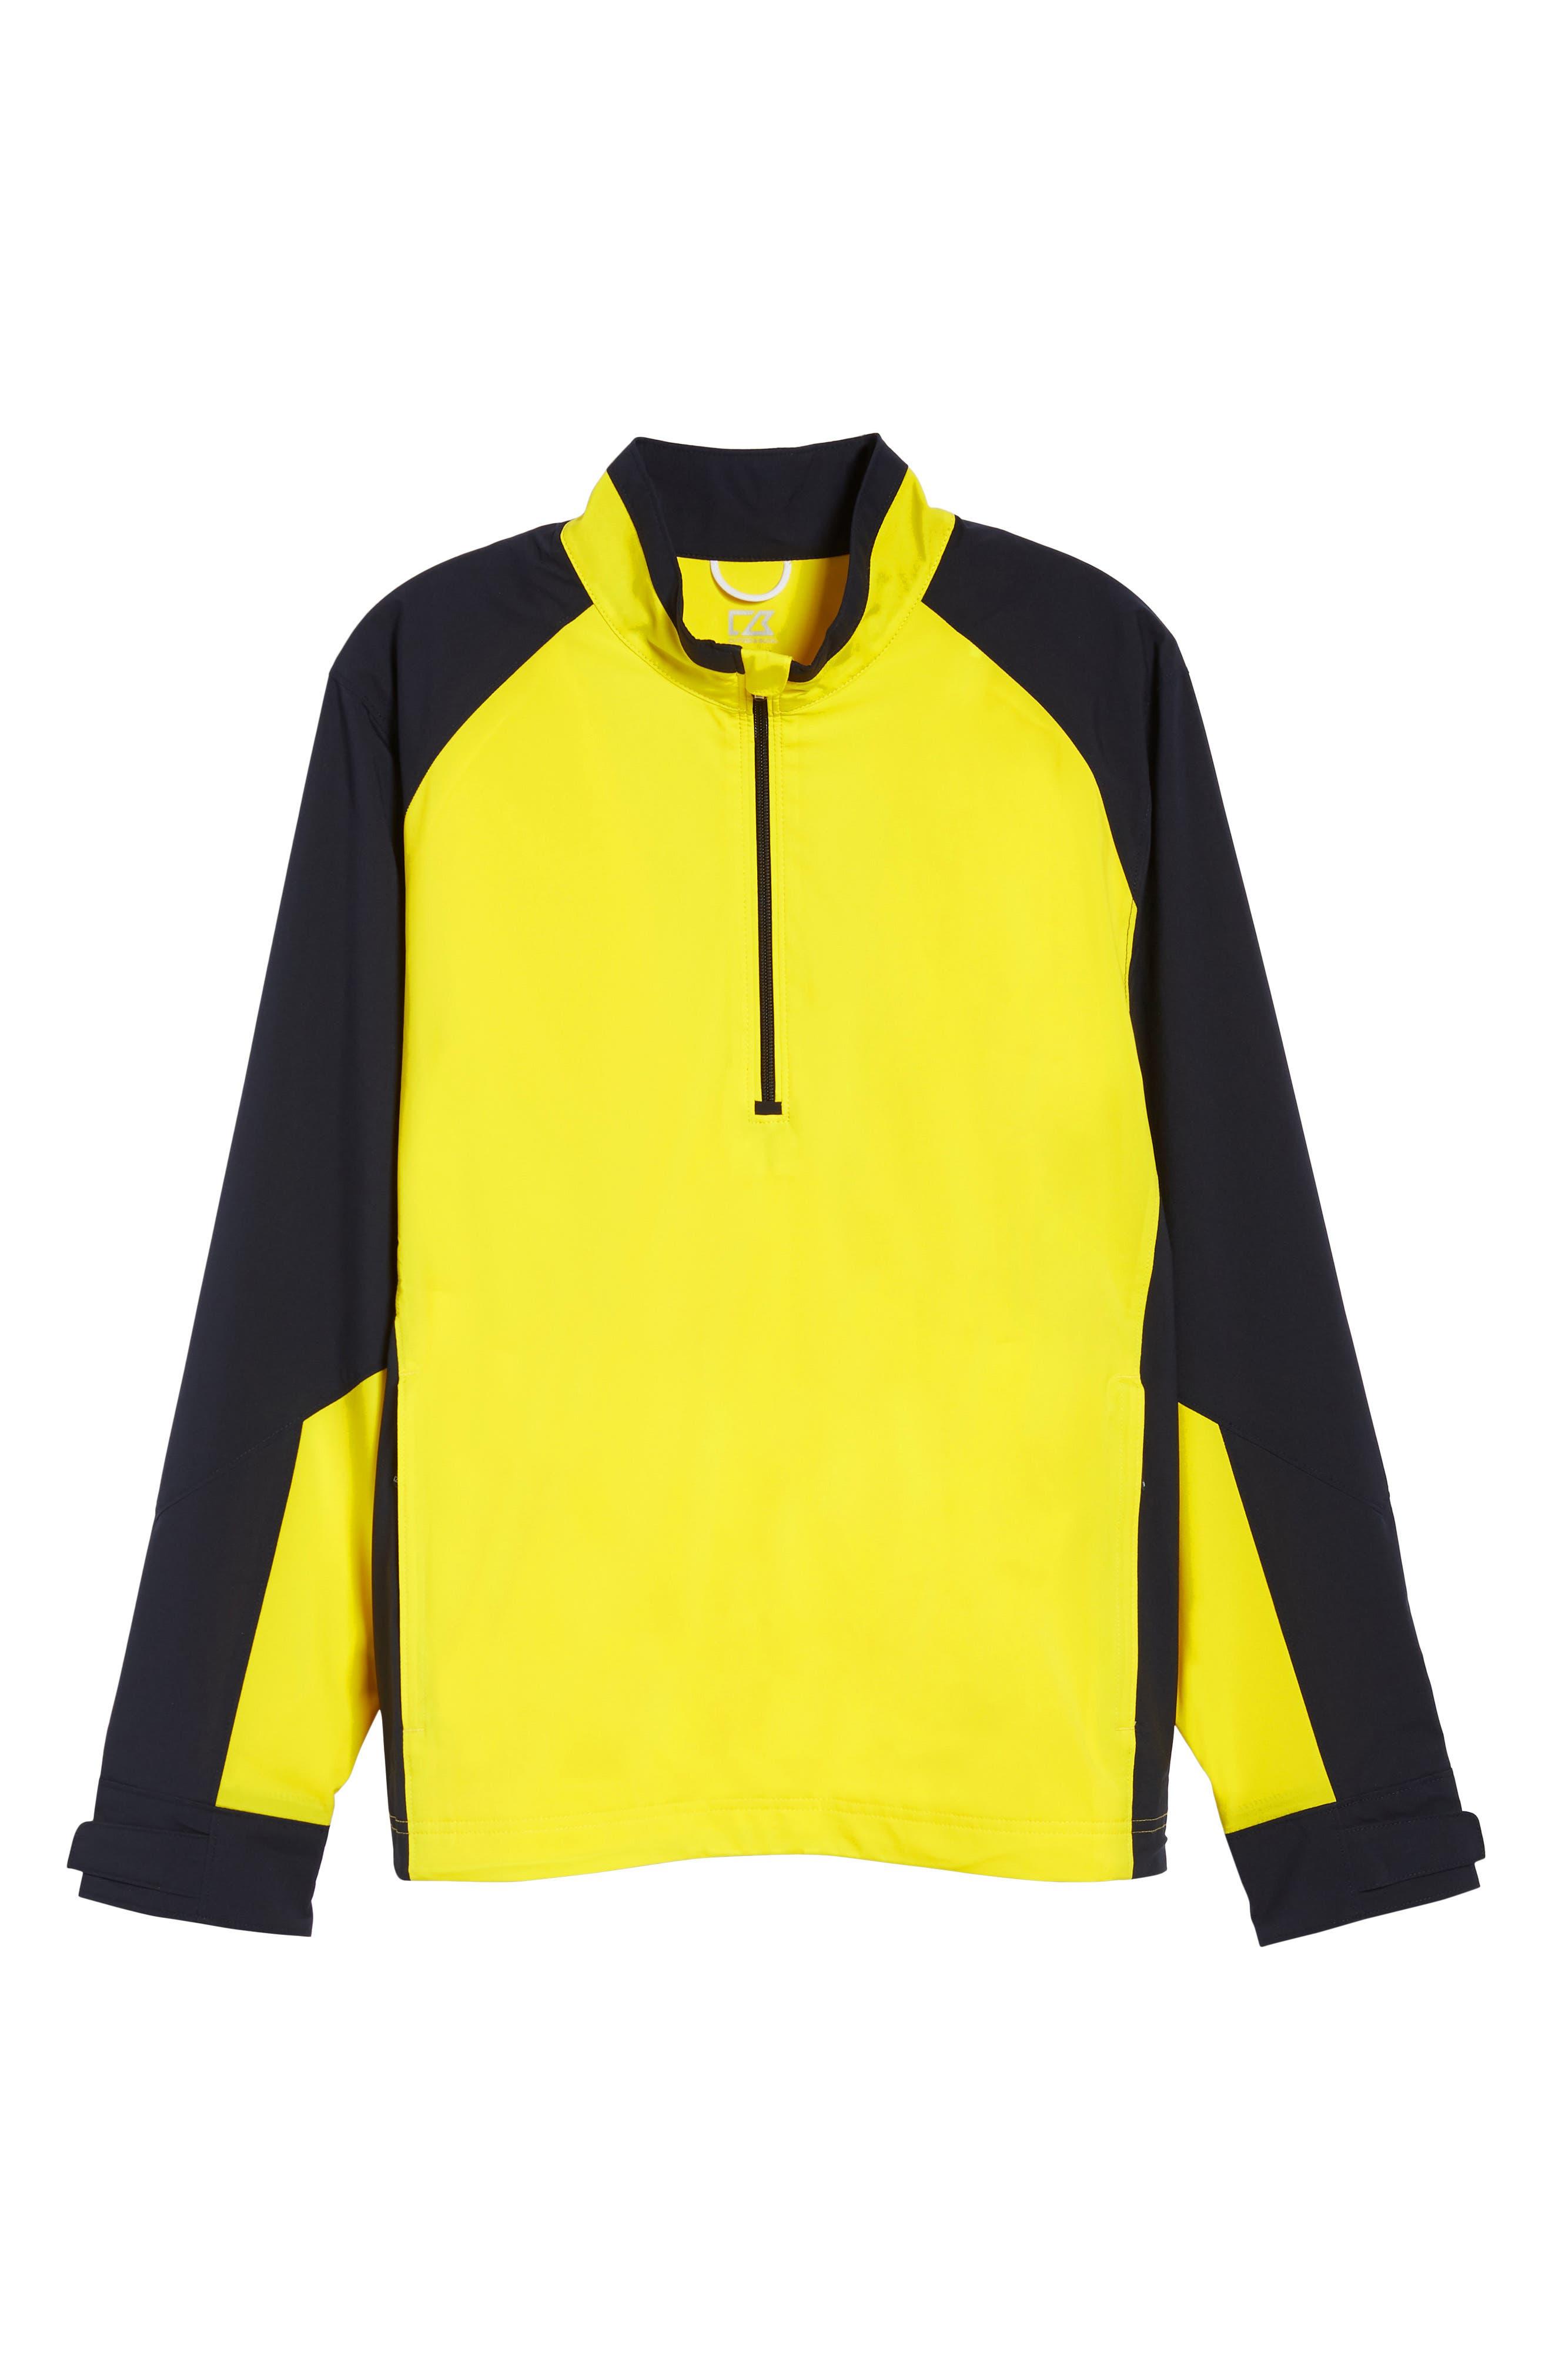 'Summit' WeatherTec Wind & Water Resistant Half Zip Jacket,                             Alternate thumbnail 6, color,                             GALAXY